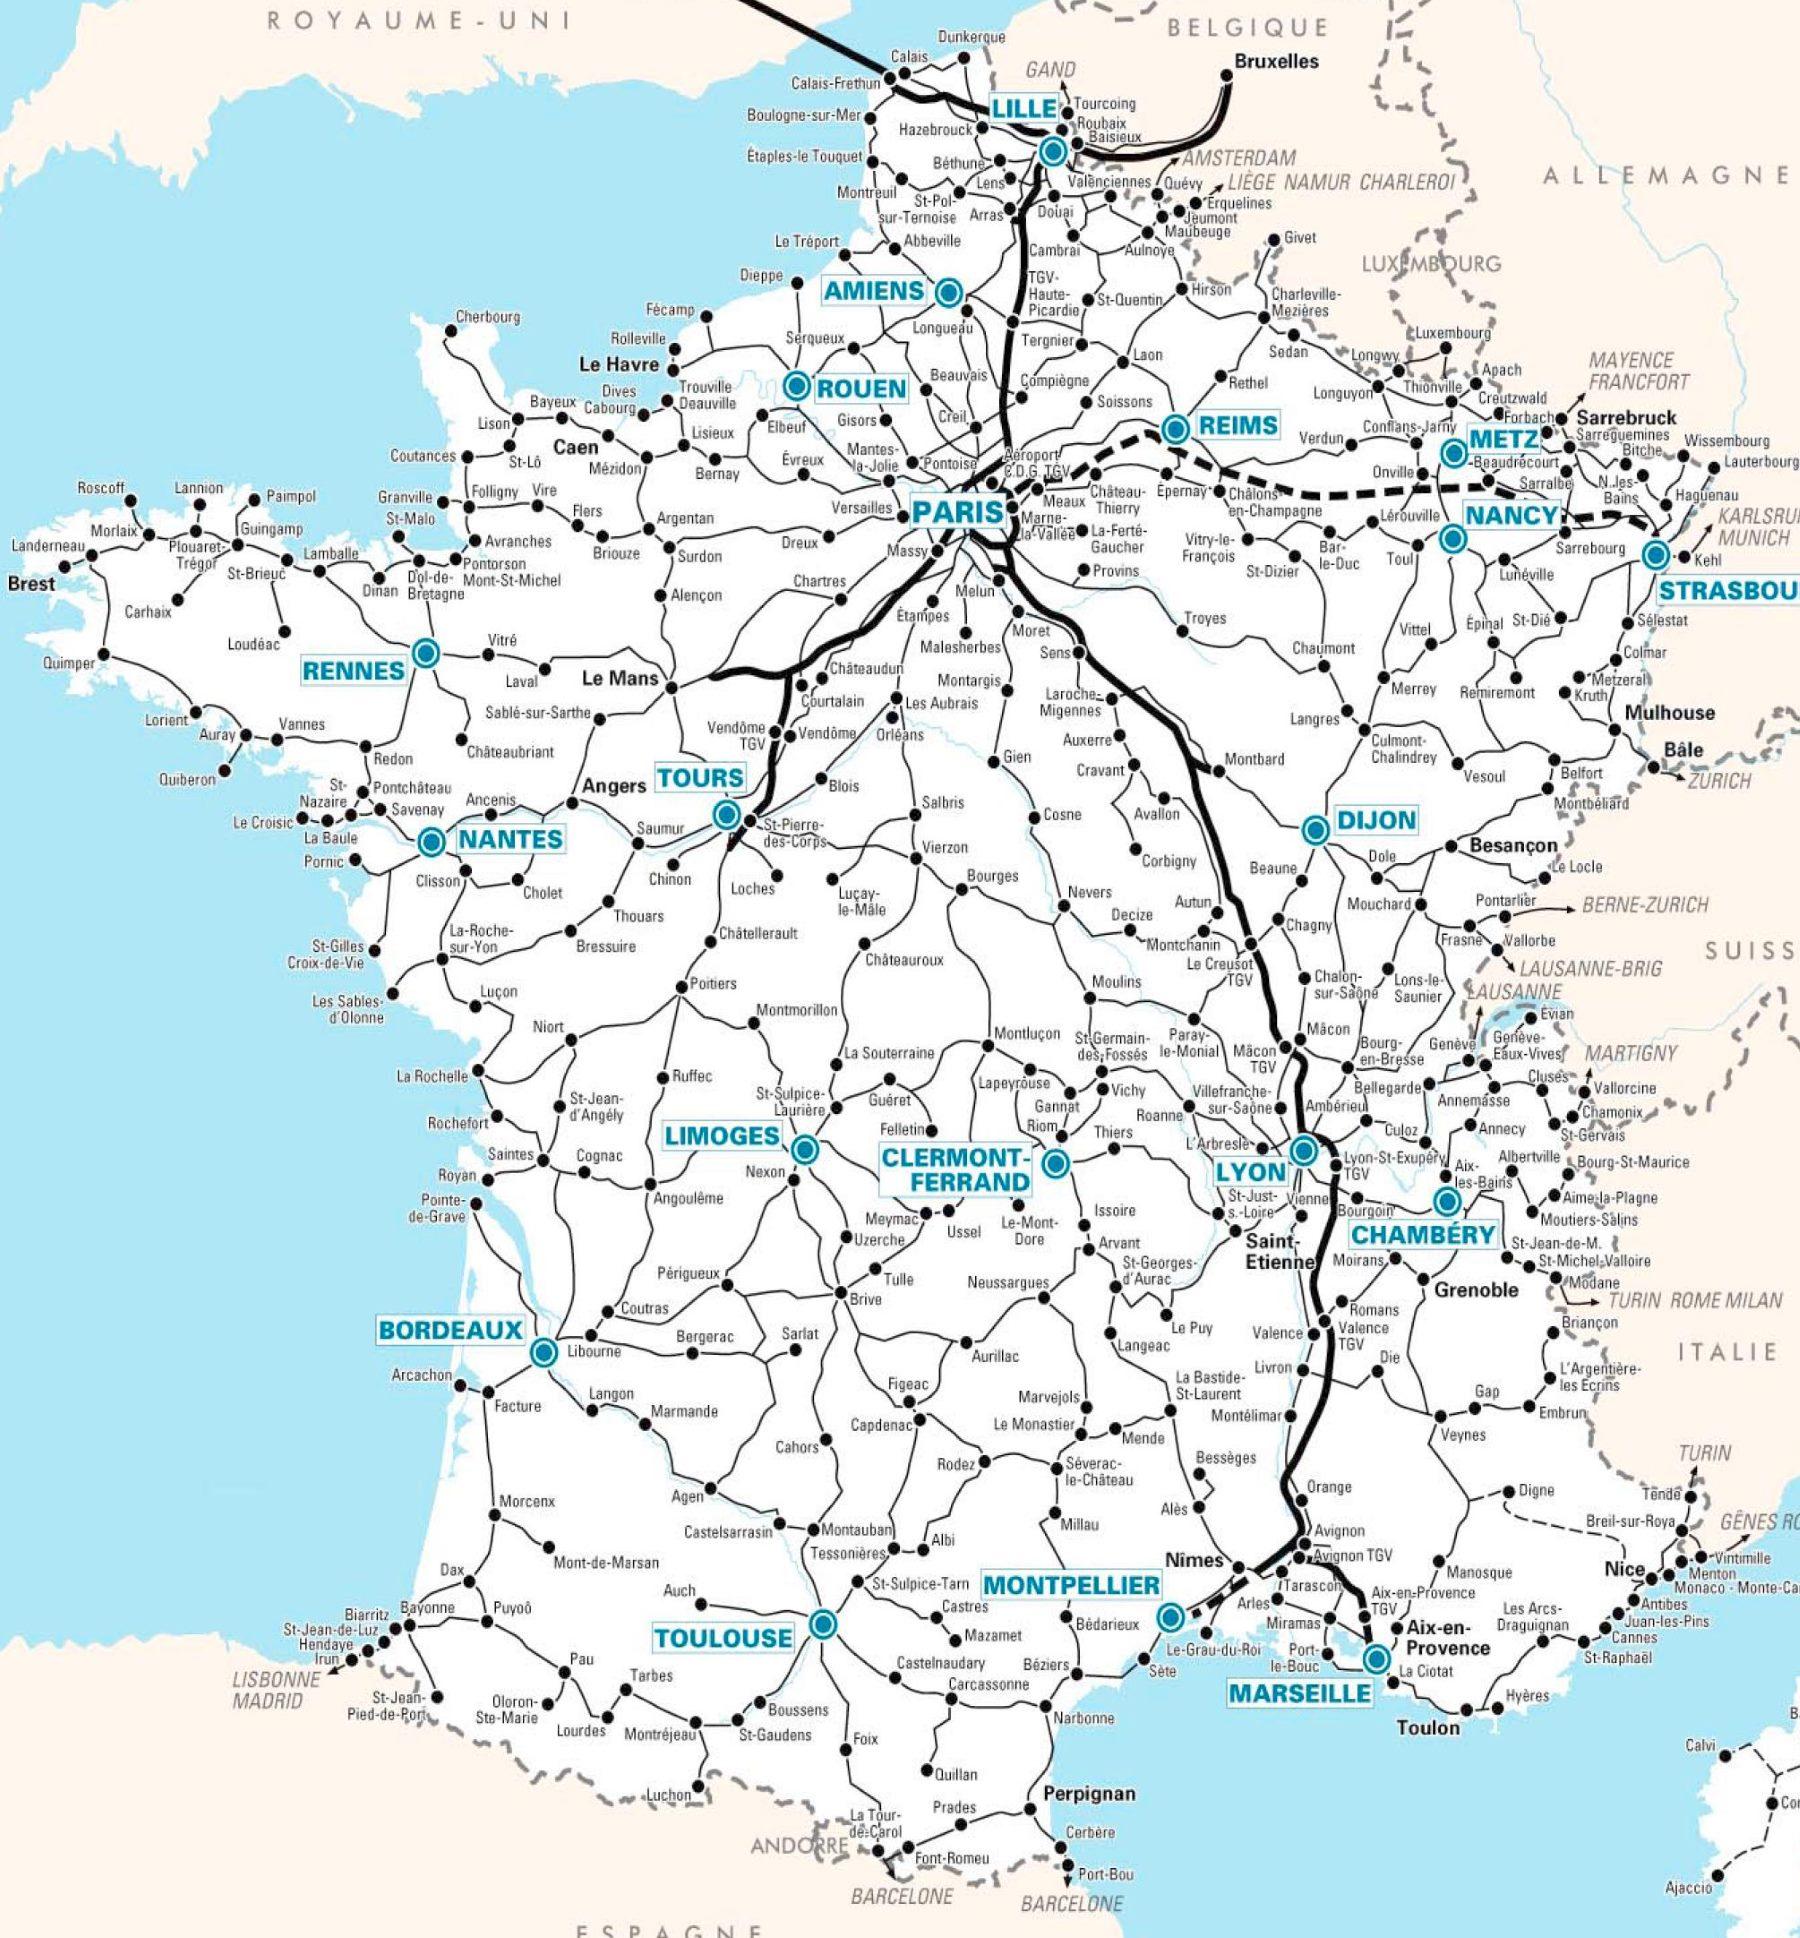 Mapa Francie Mesta Sousedni Staty Dle Regionu